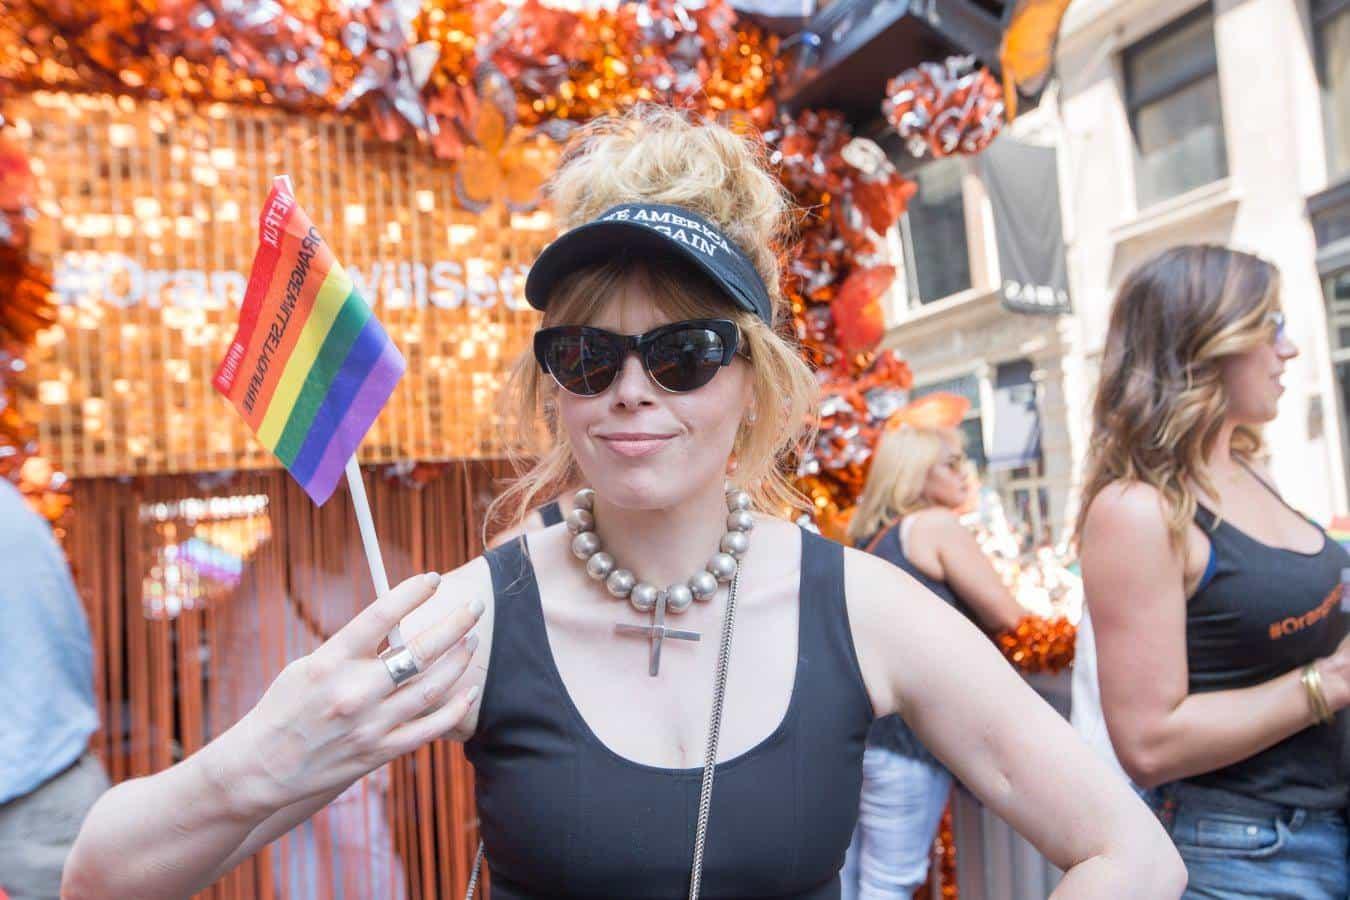 Oitnb New York6, Hay una lesbiana en mi sopa